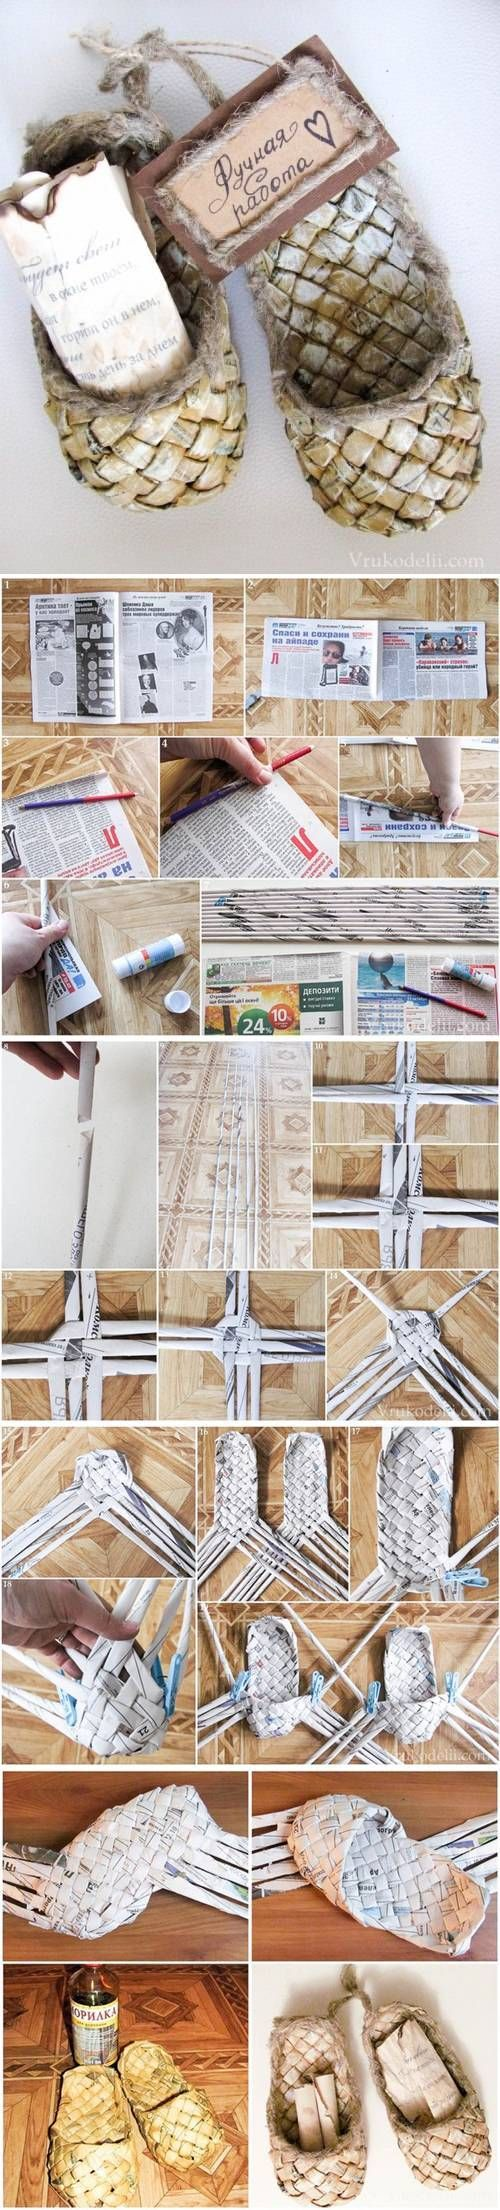 DIY Souvenir for Home DIY Projects   UsefulDIY.com Follow us on Facebook ==> https://www.facebook.com/UsefulDiy